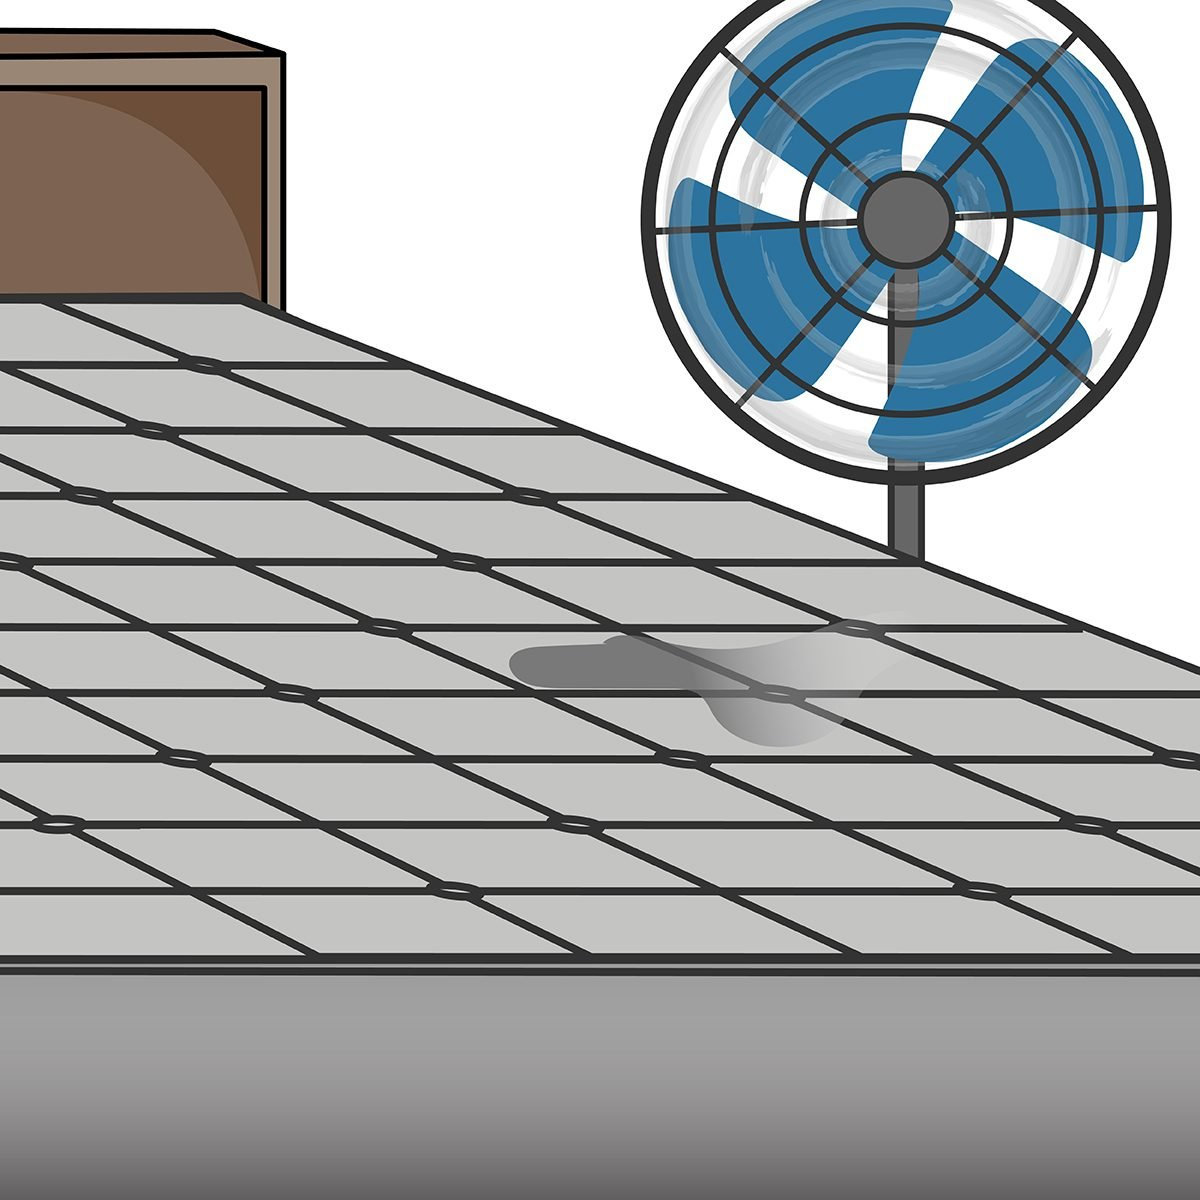 Dry the mattress